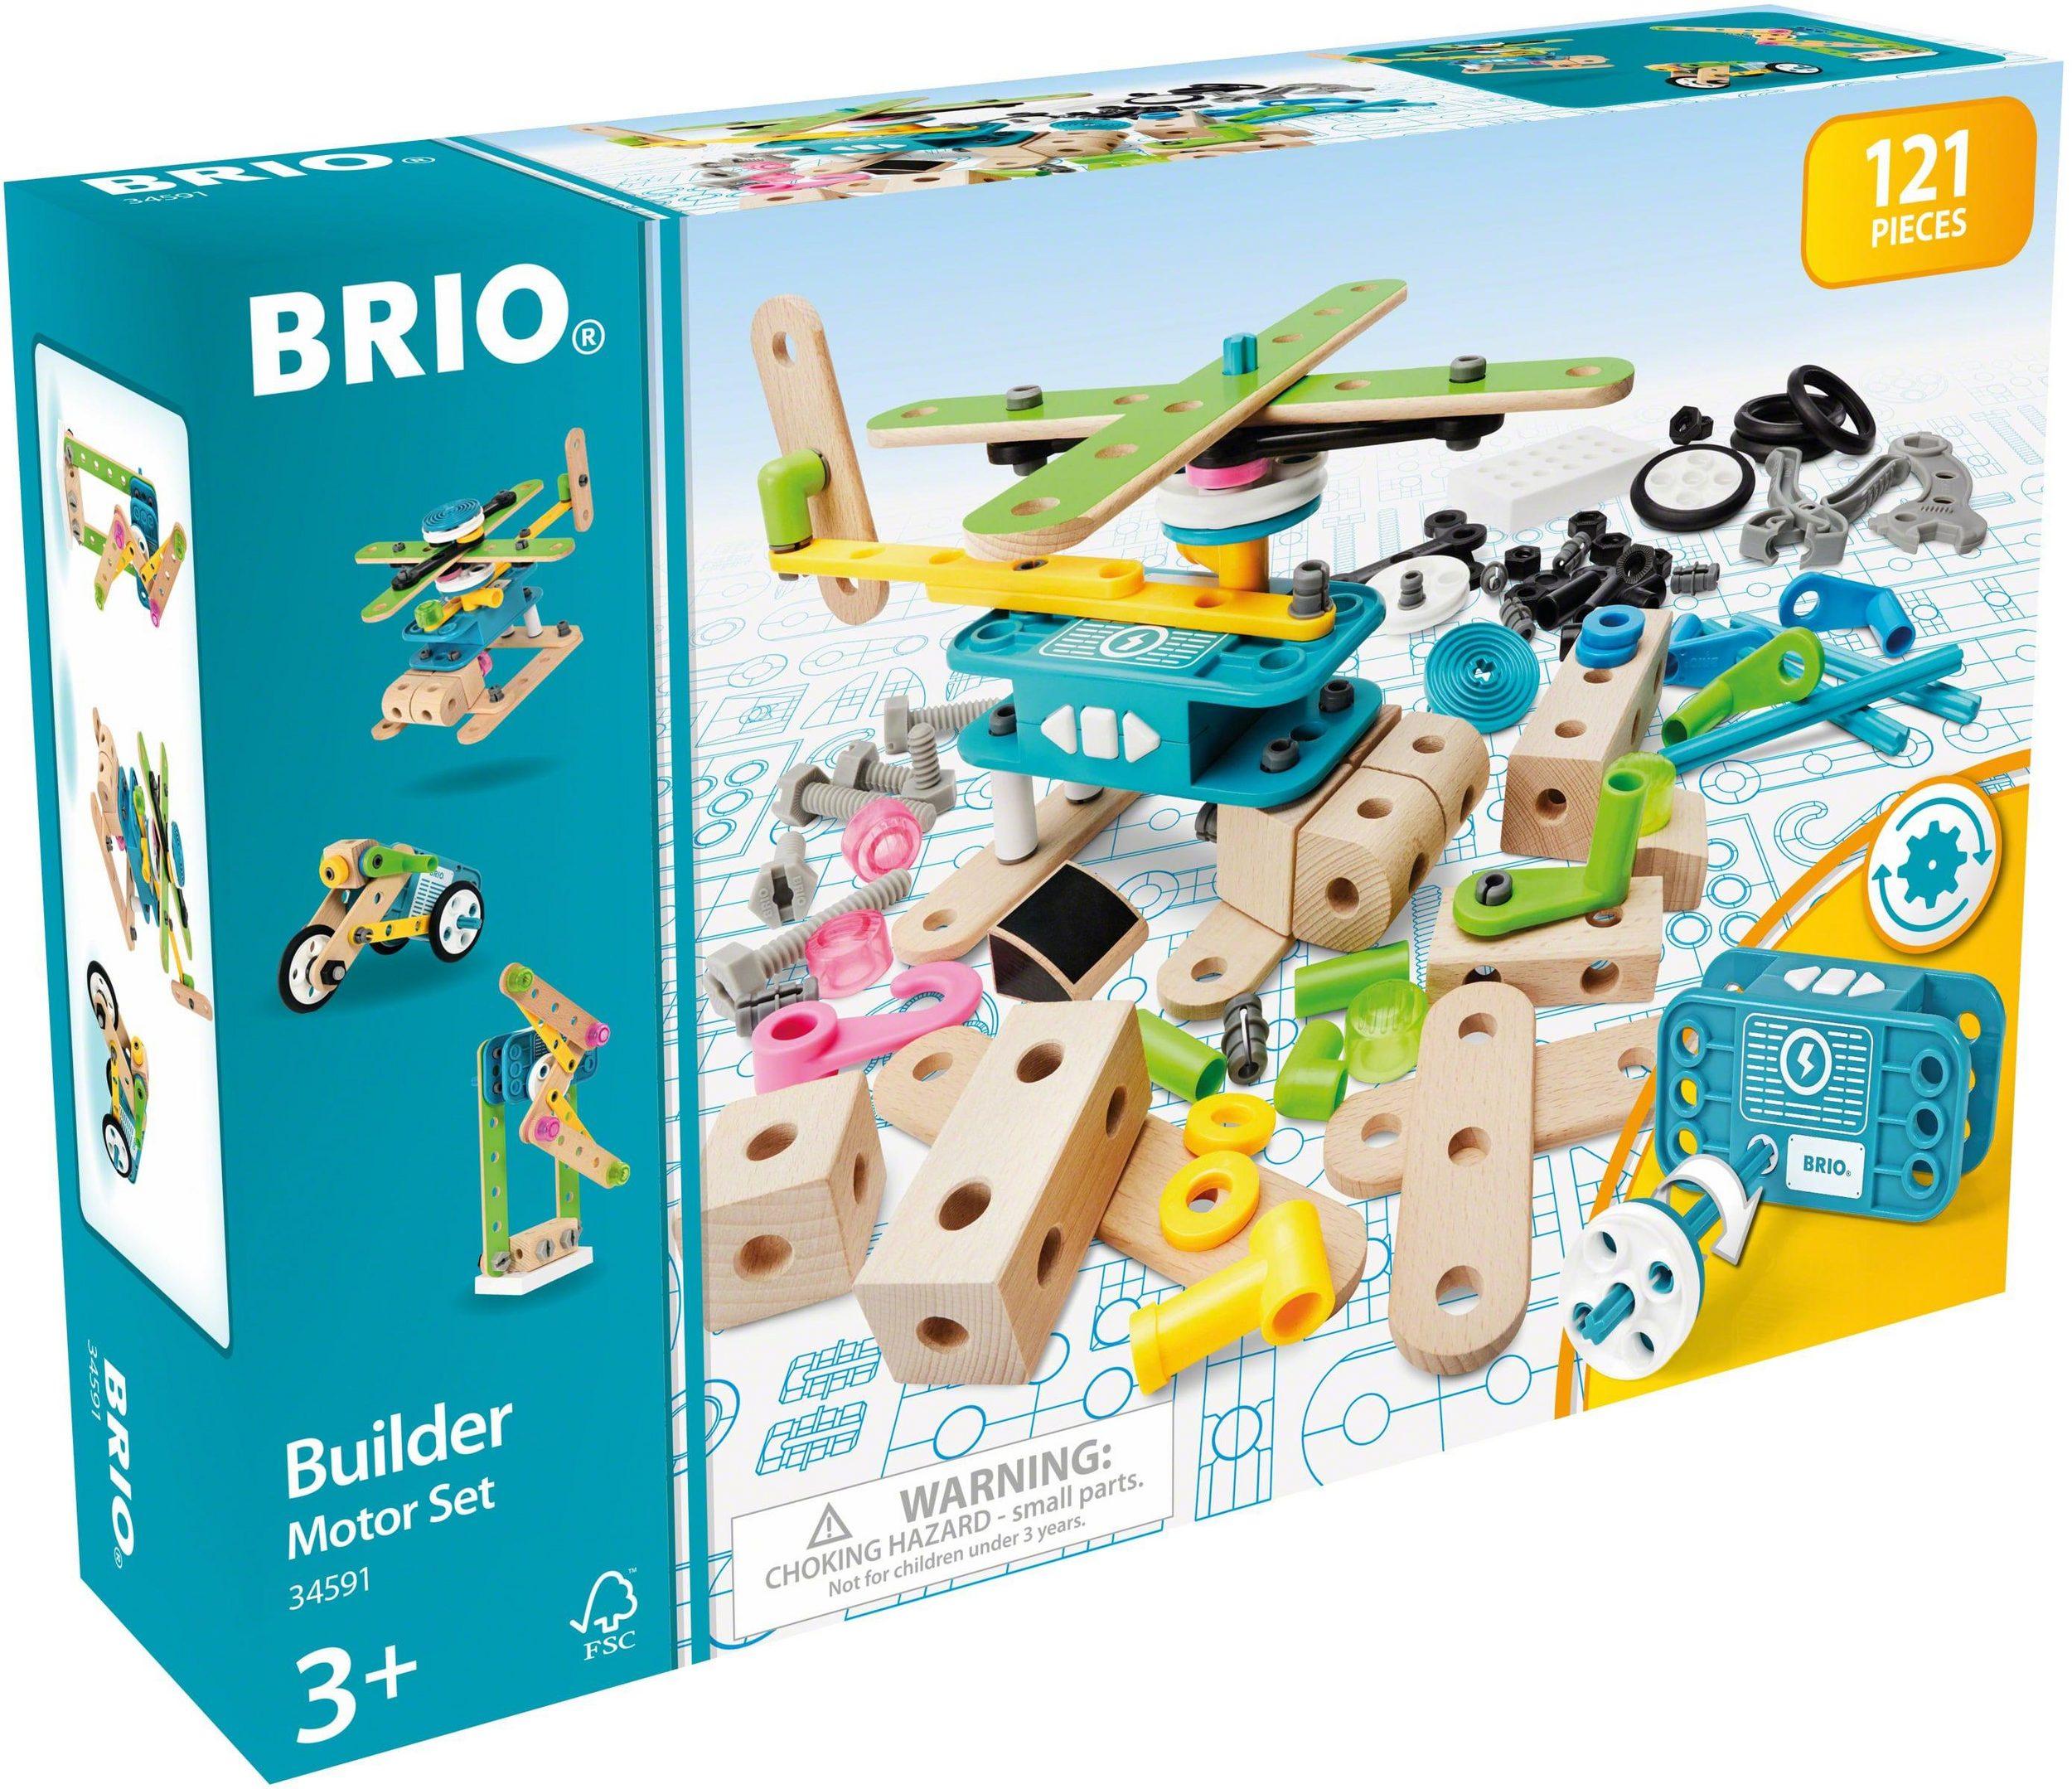 BRIO - Builder Motor- Konstruktionsset, 120 tlg. (34591)